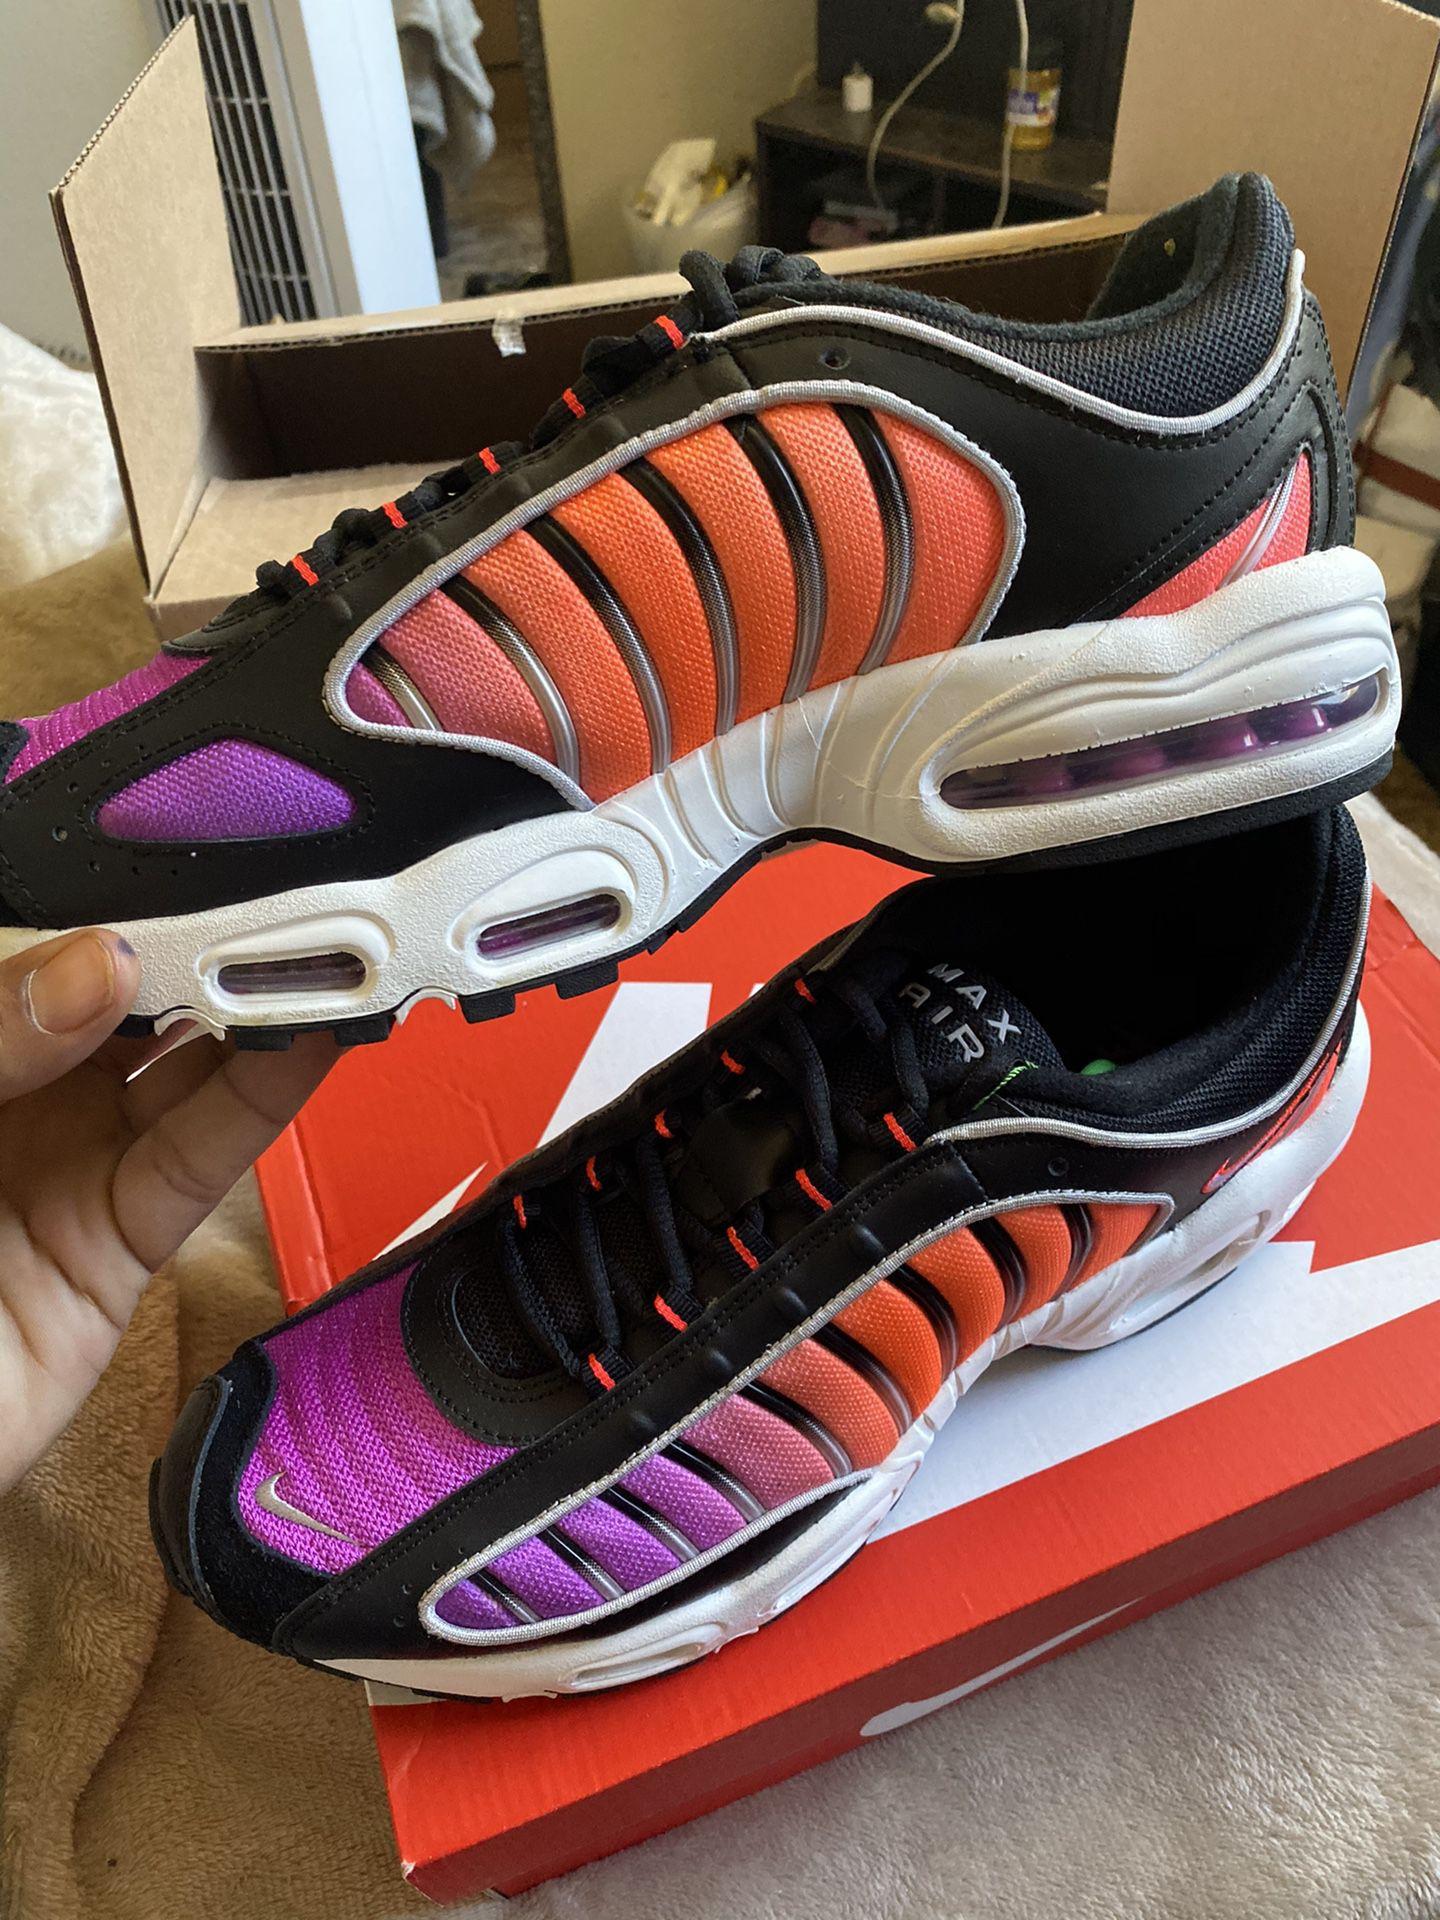 Nike Tailwind Suns Size 11